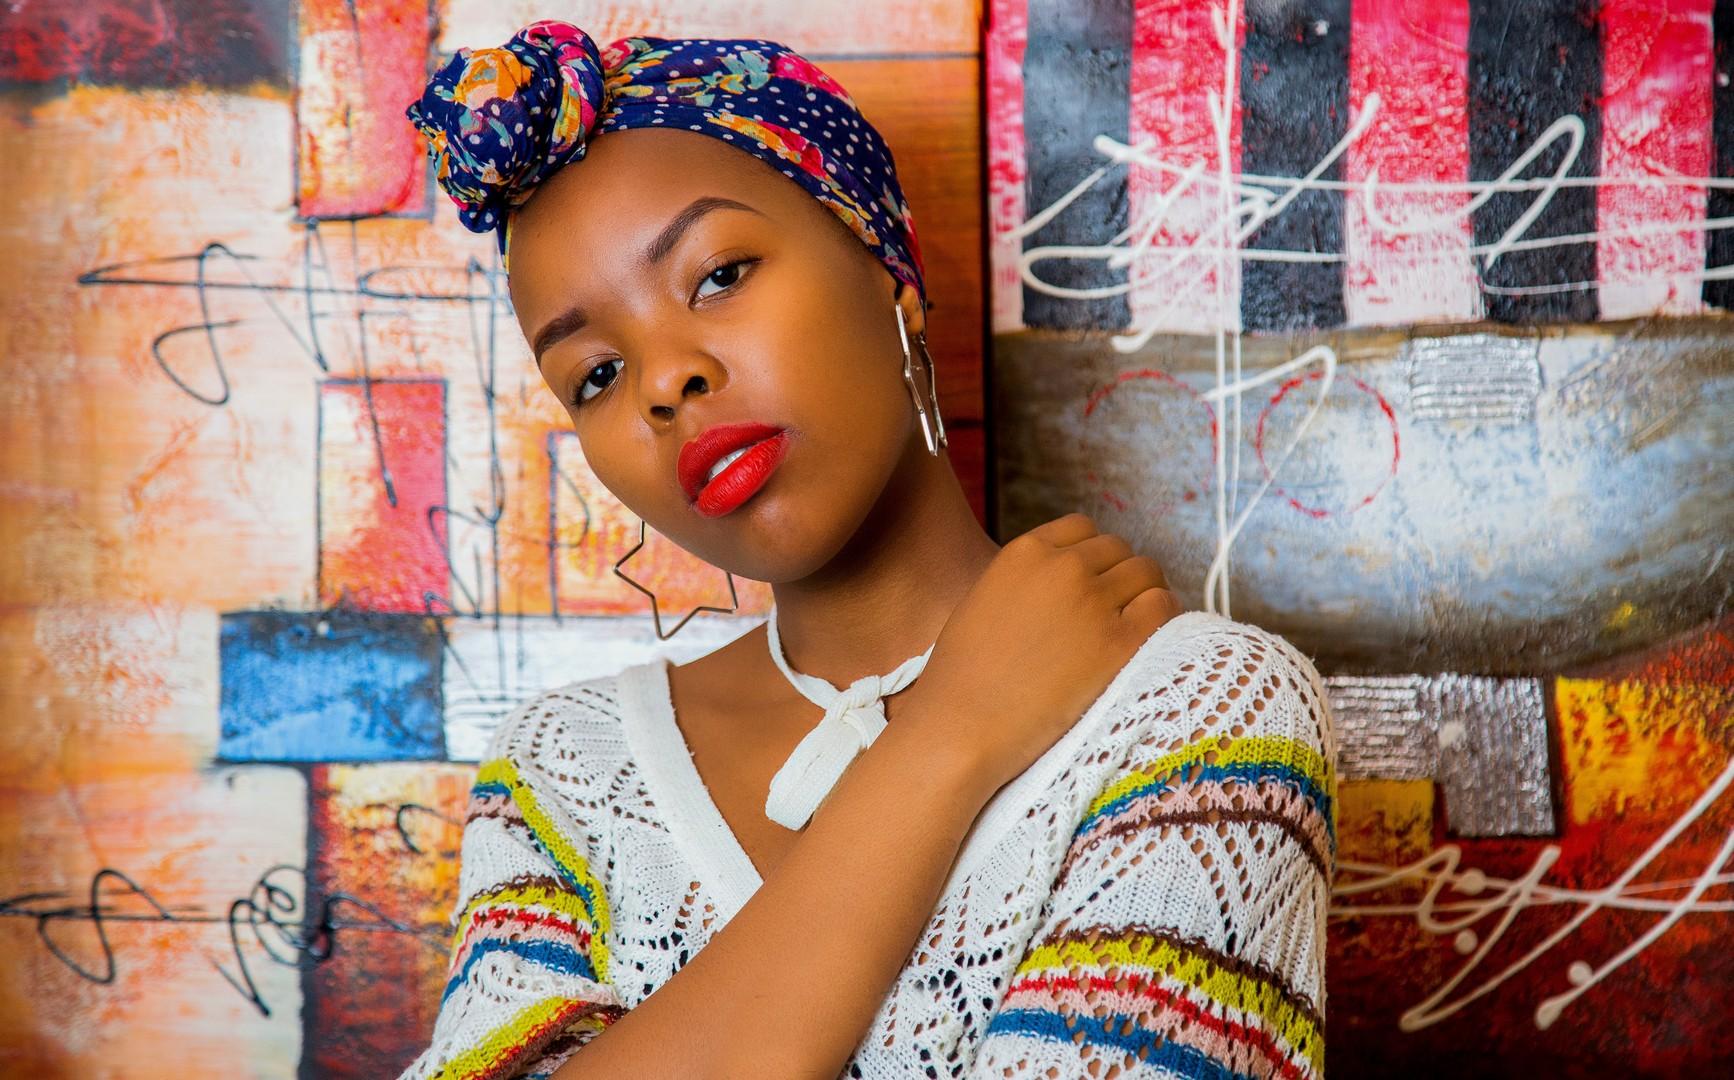 turbante feminino 2 - Diferentes maneiras de usar turbante feminino